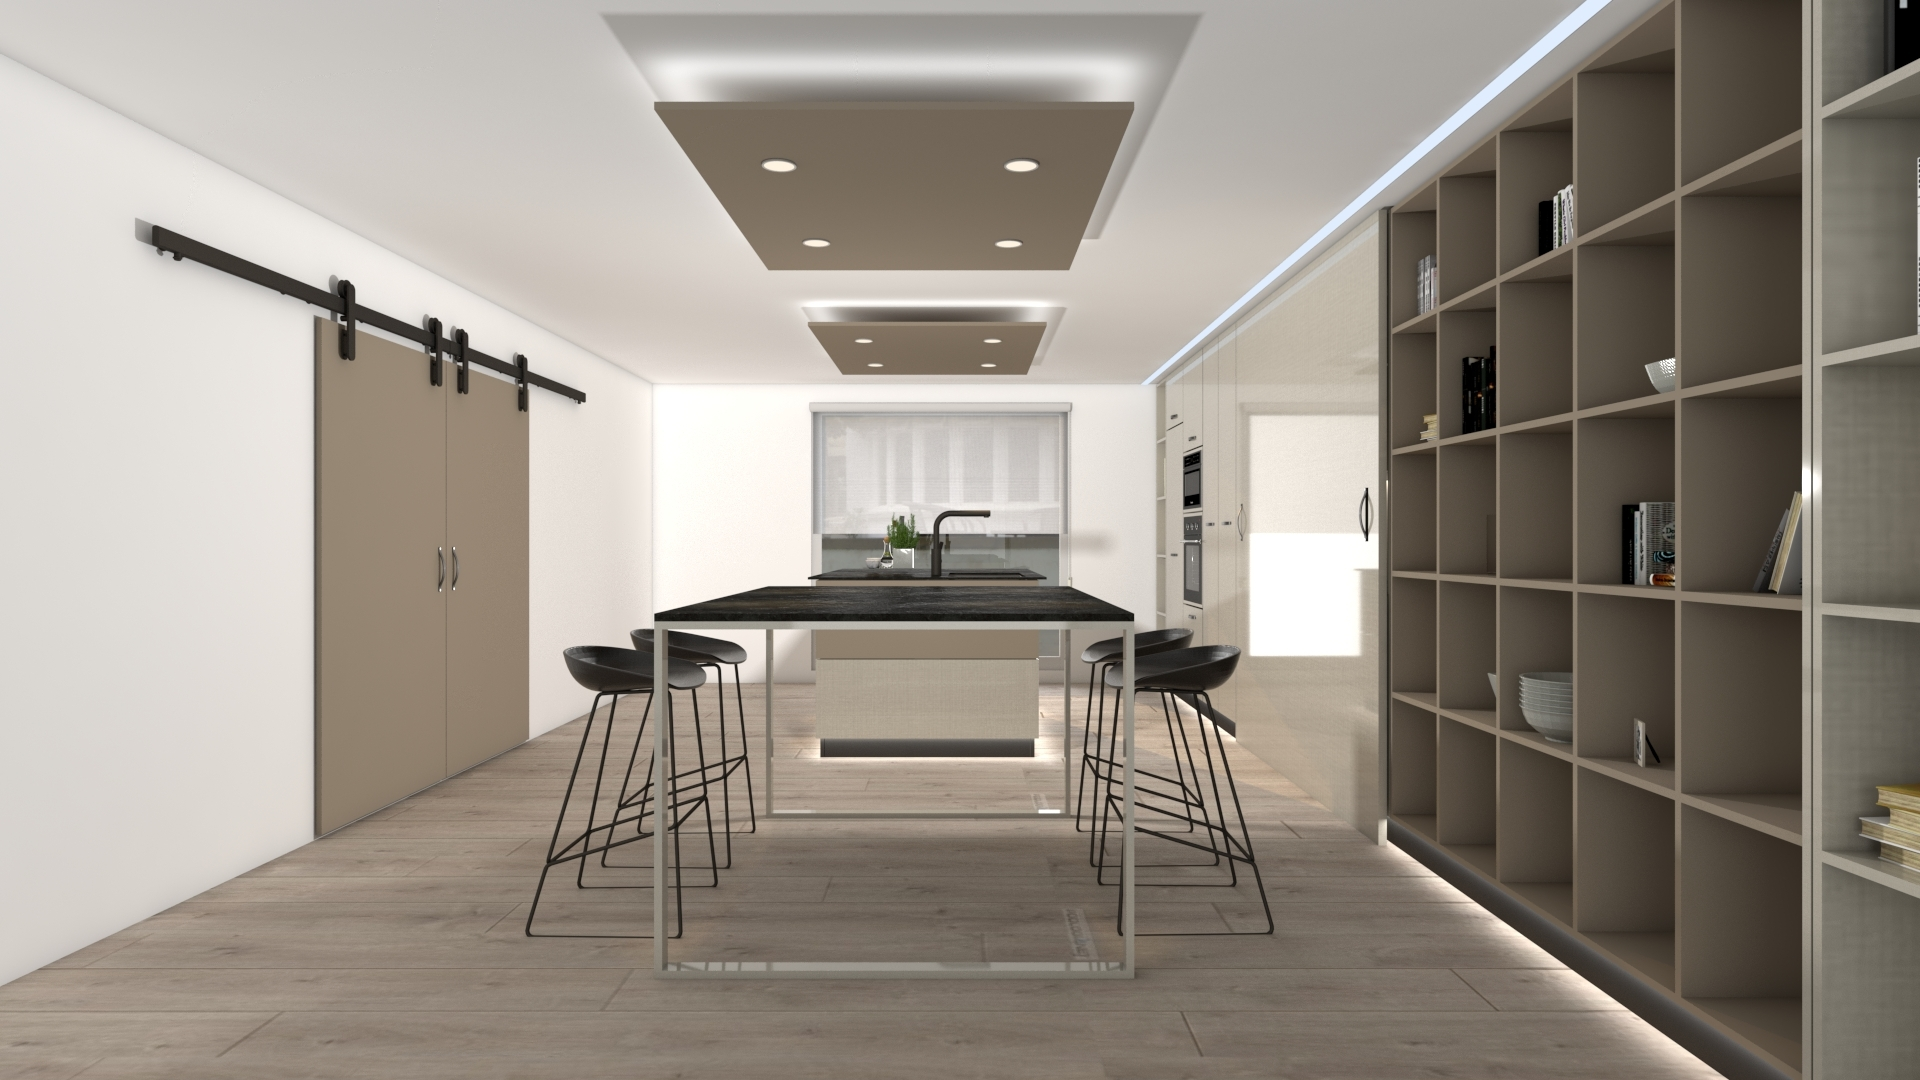 Colección T4 espacio gran iluminación.